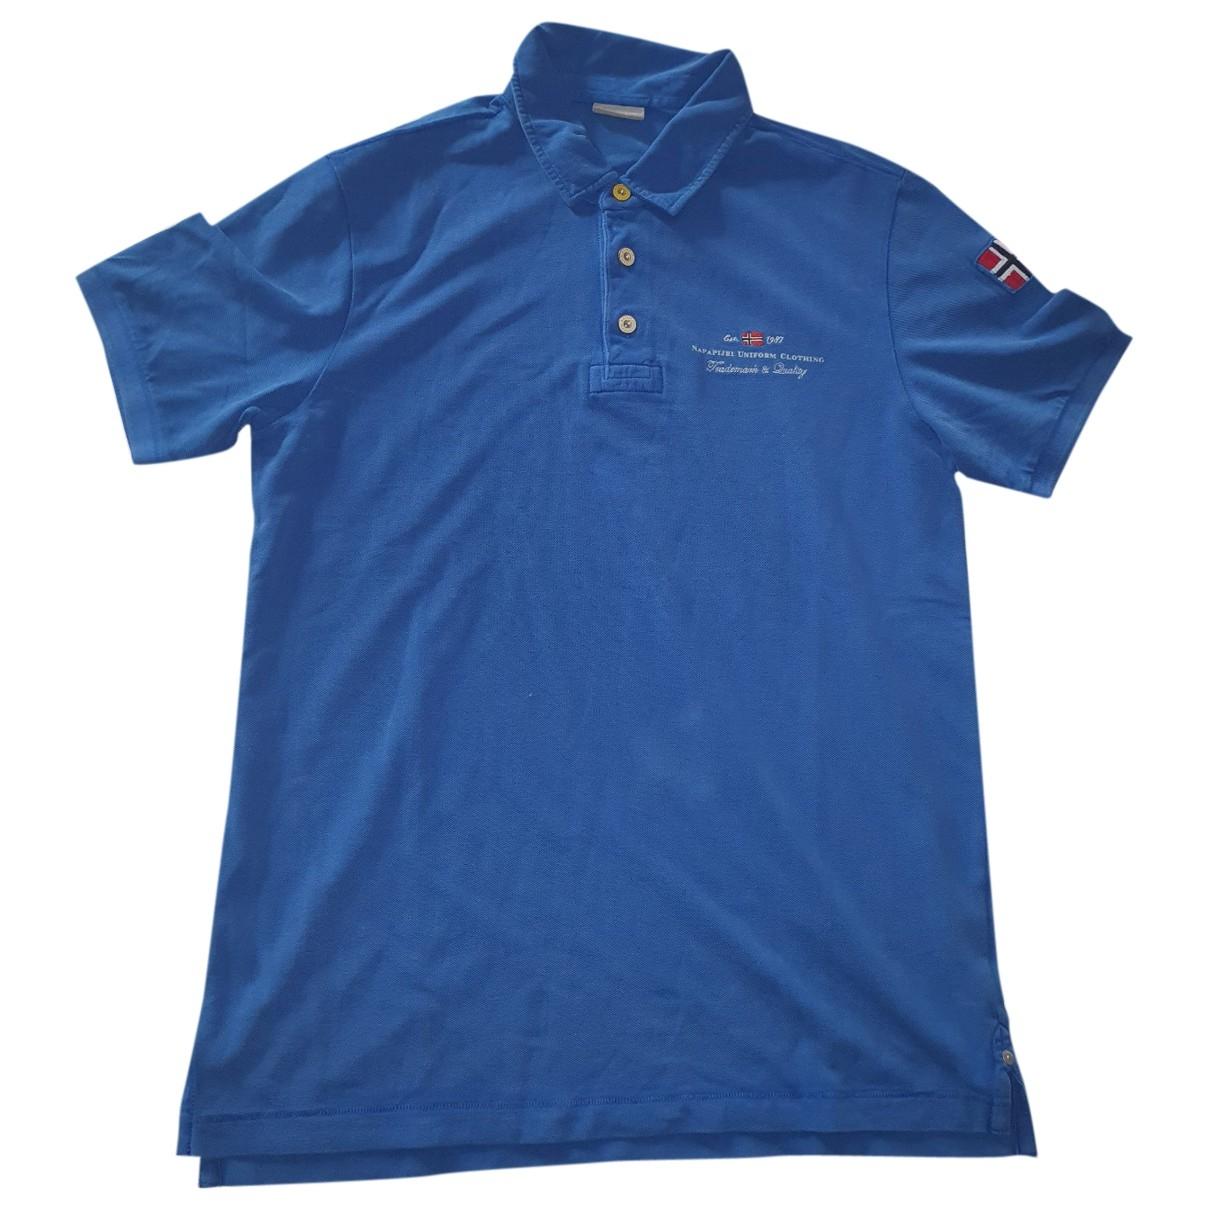 Napapijri \N Blue Cotton Polo shirts for Men L International